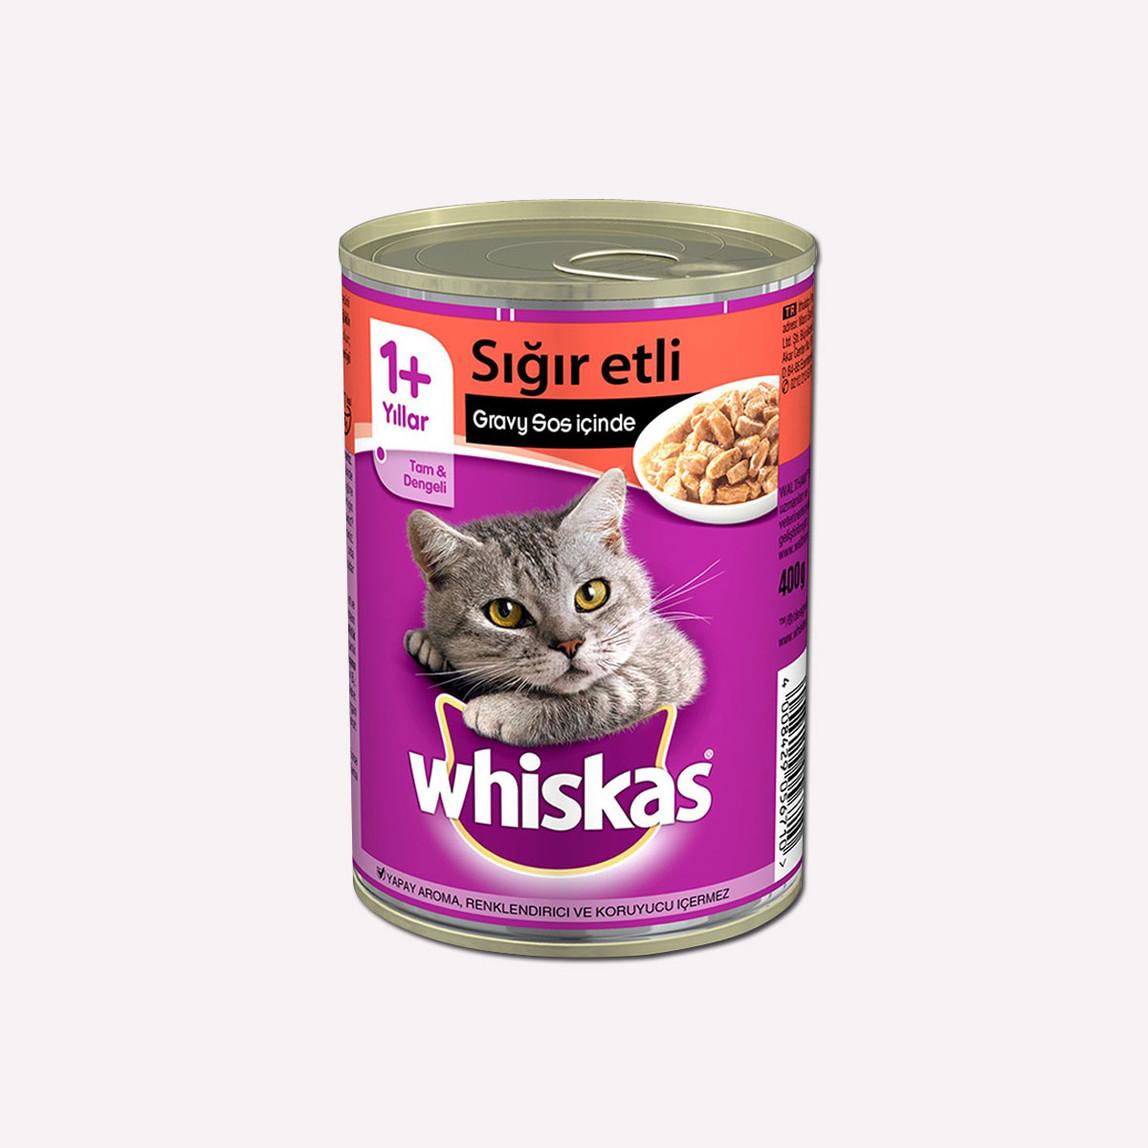 Whiskas Sığır Etli Konserve Kedi Maması 400 gr